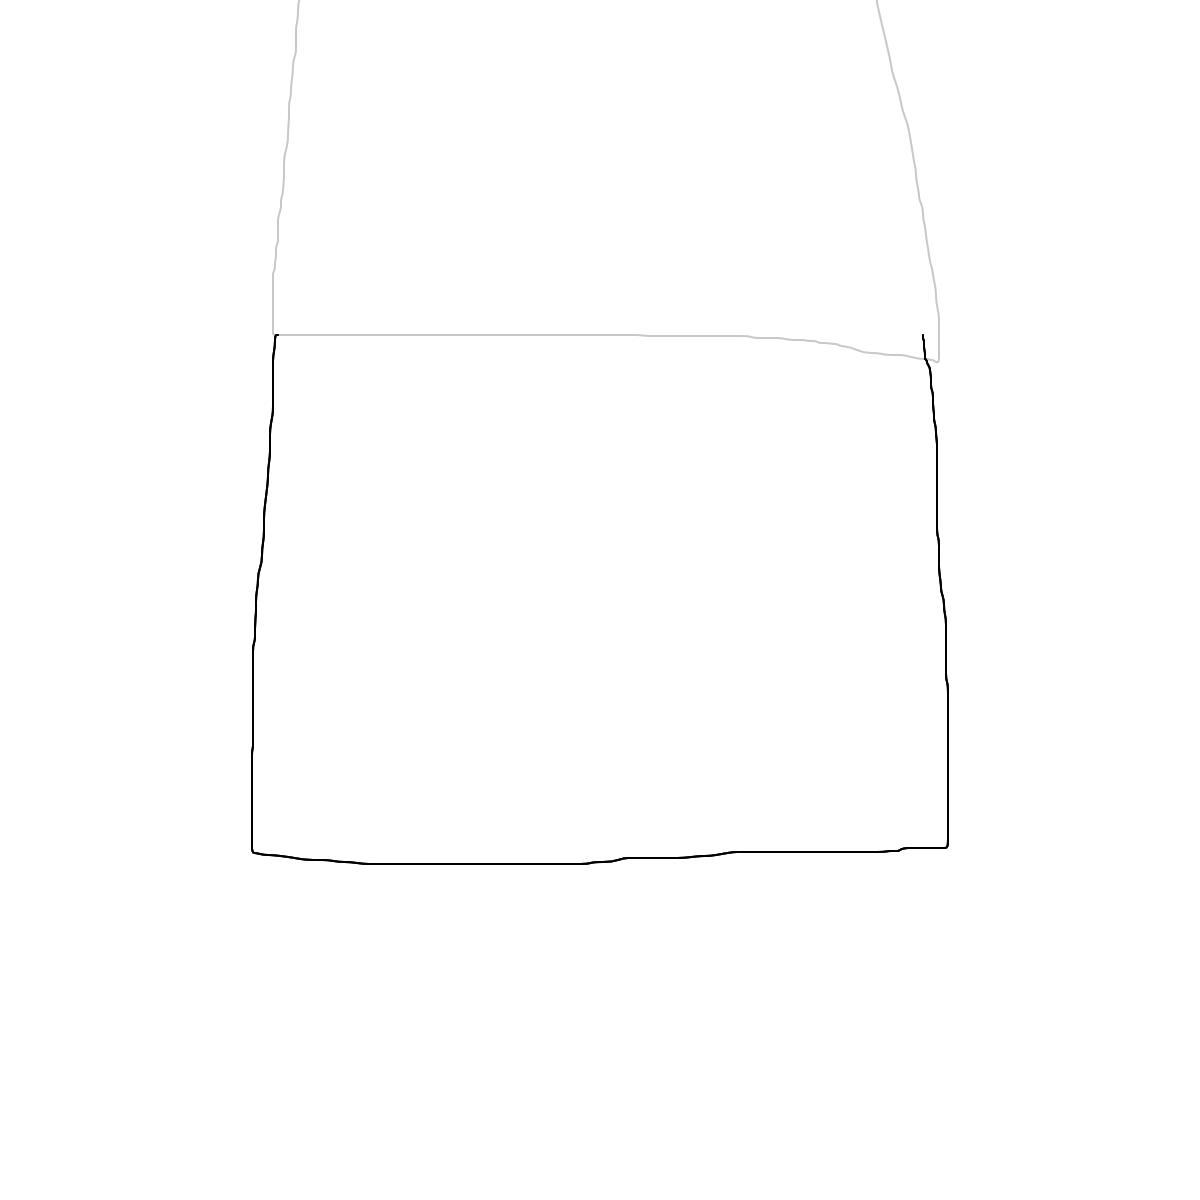 BAAAM drawing#18819 lat:55.7507057189941400lng: 37.6162948608398440